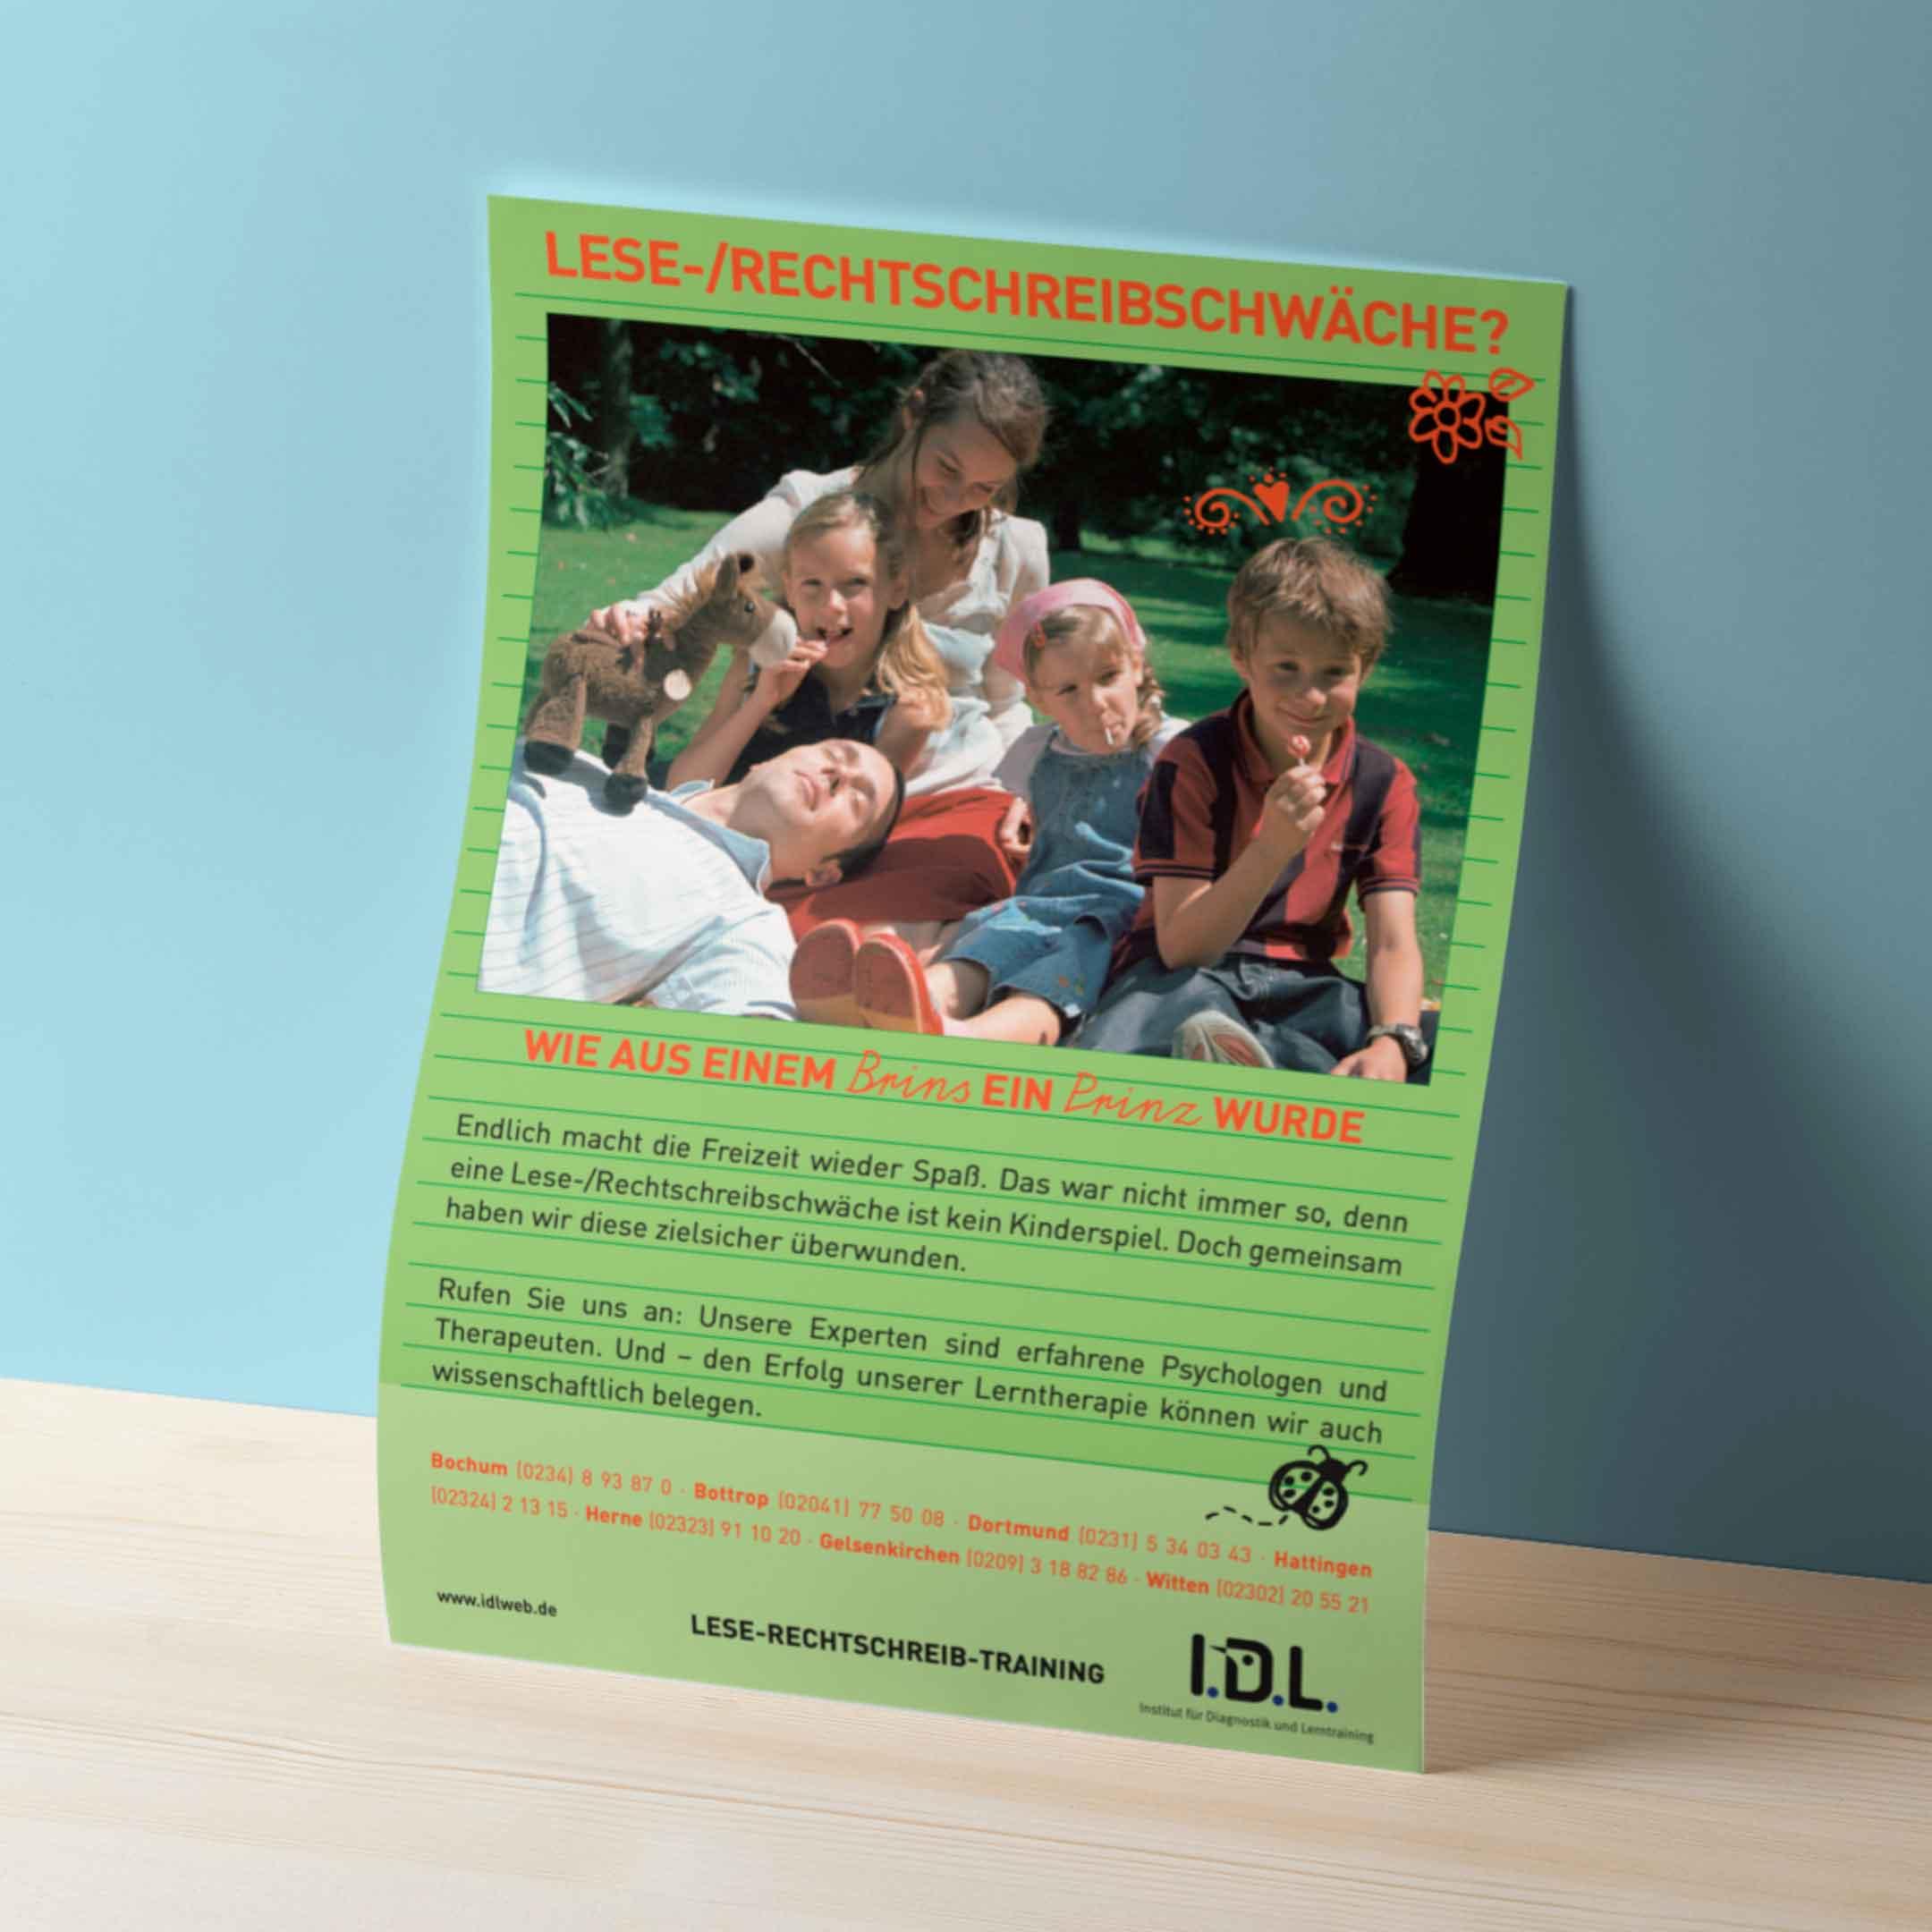 hilledesign Portfolio IDL - Poster